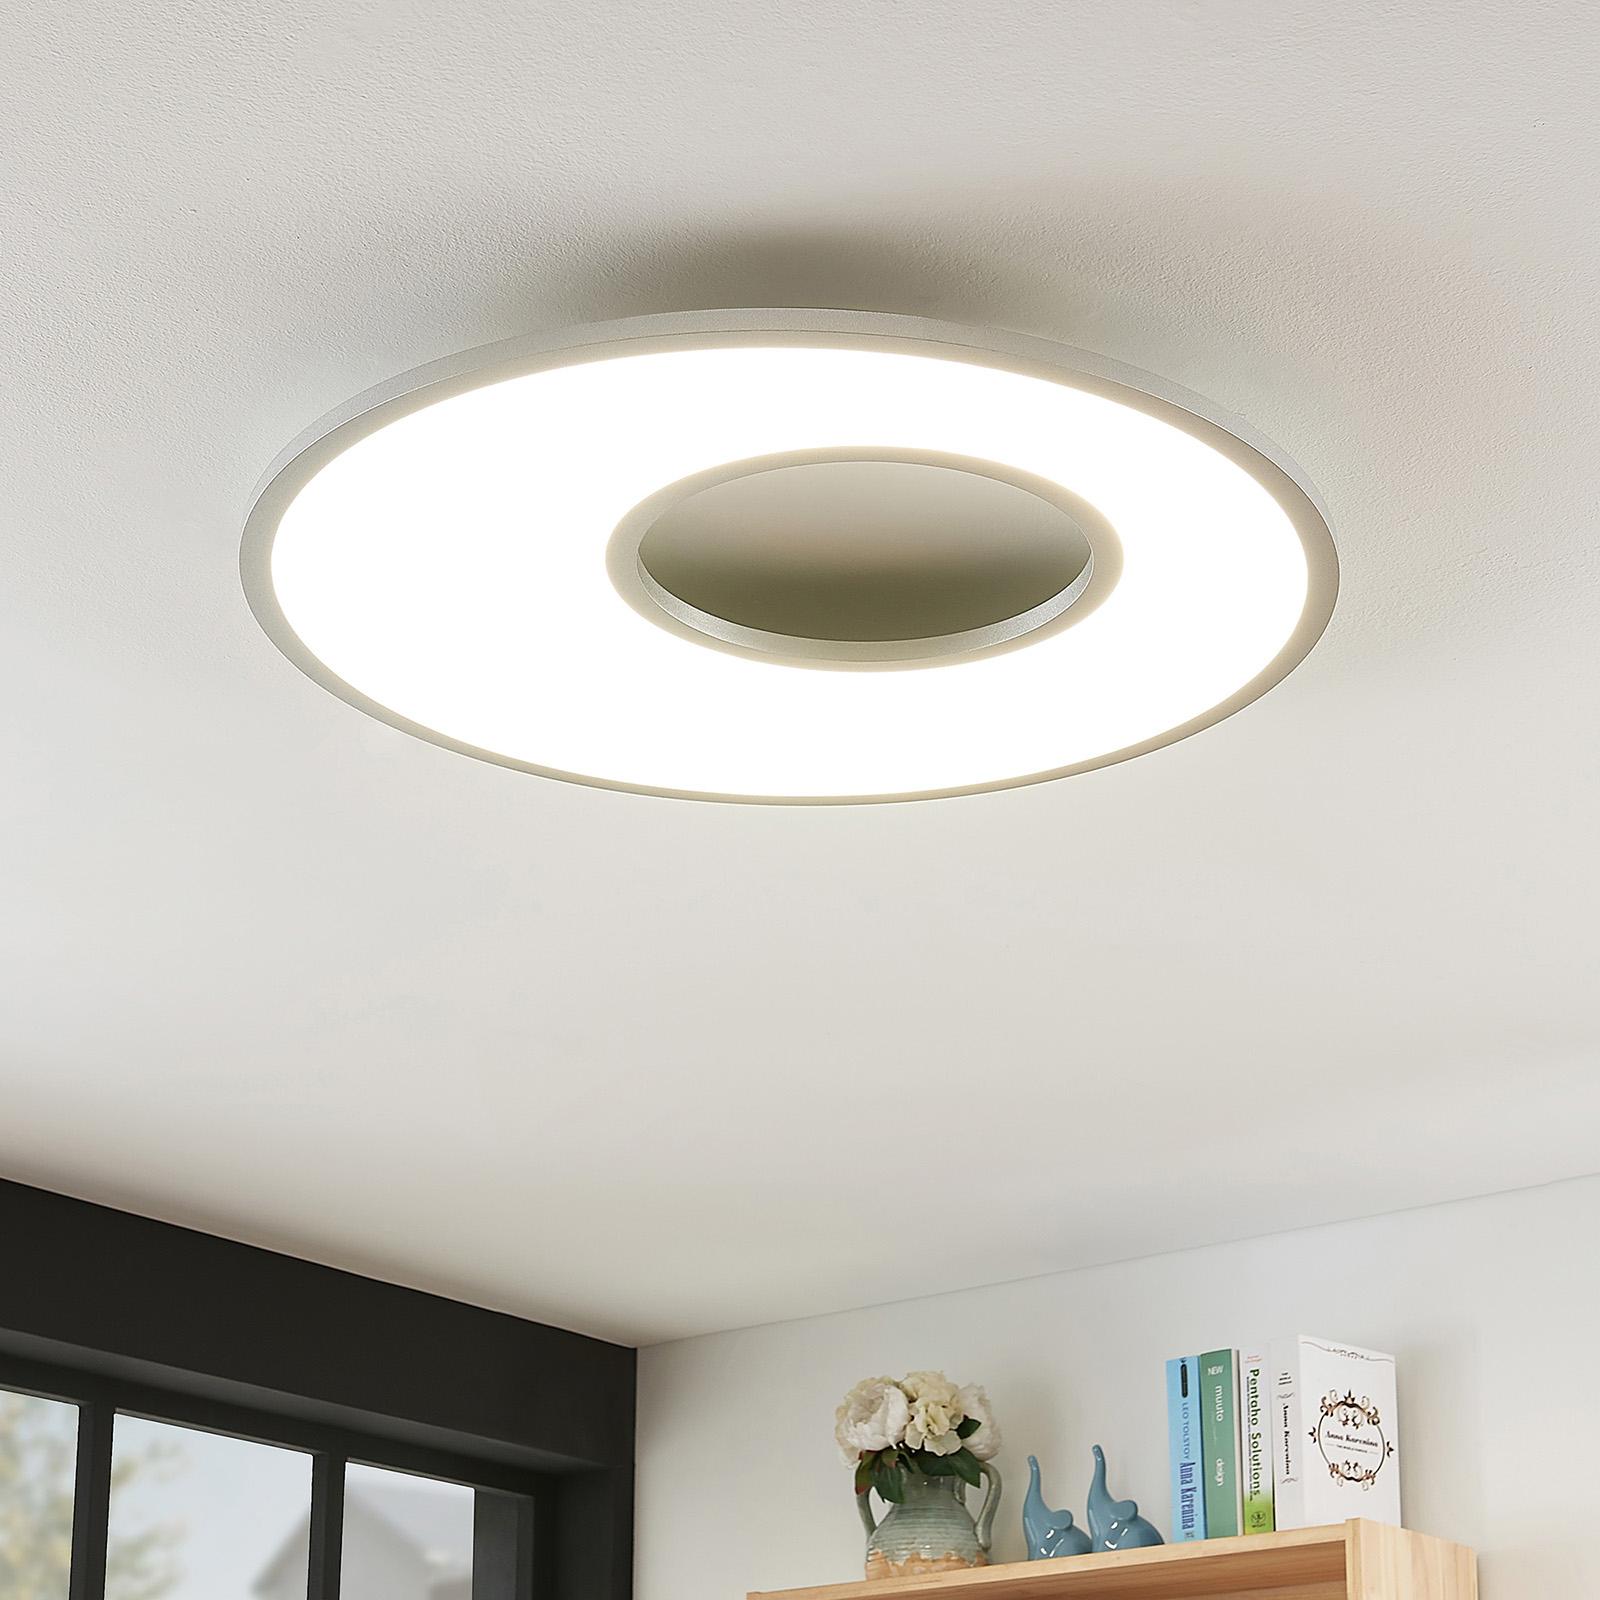 Plafonnier LED Durun, dimmable, CCT, rond, 60cm